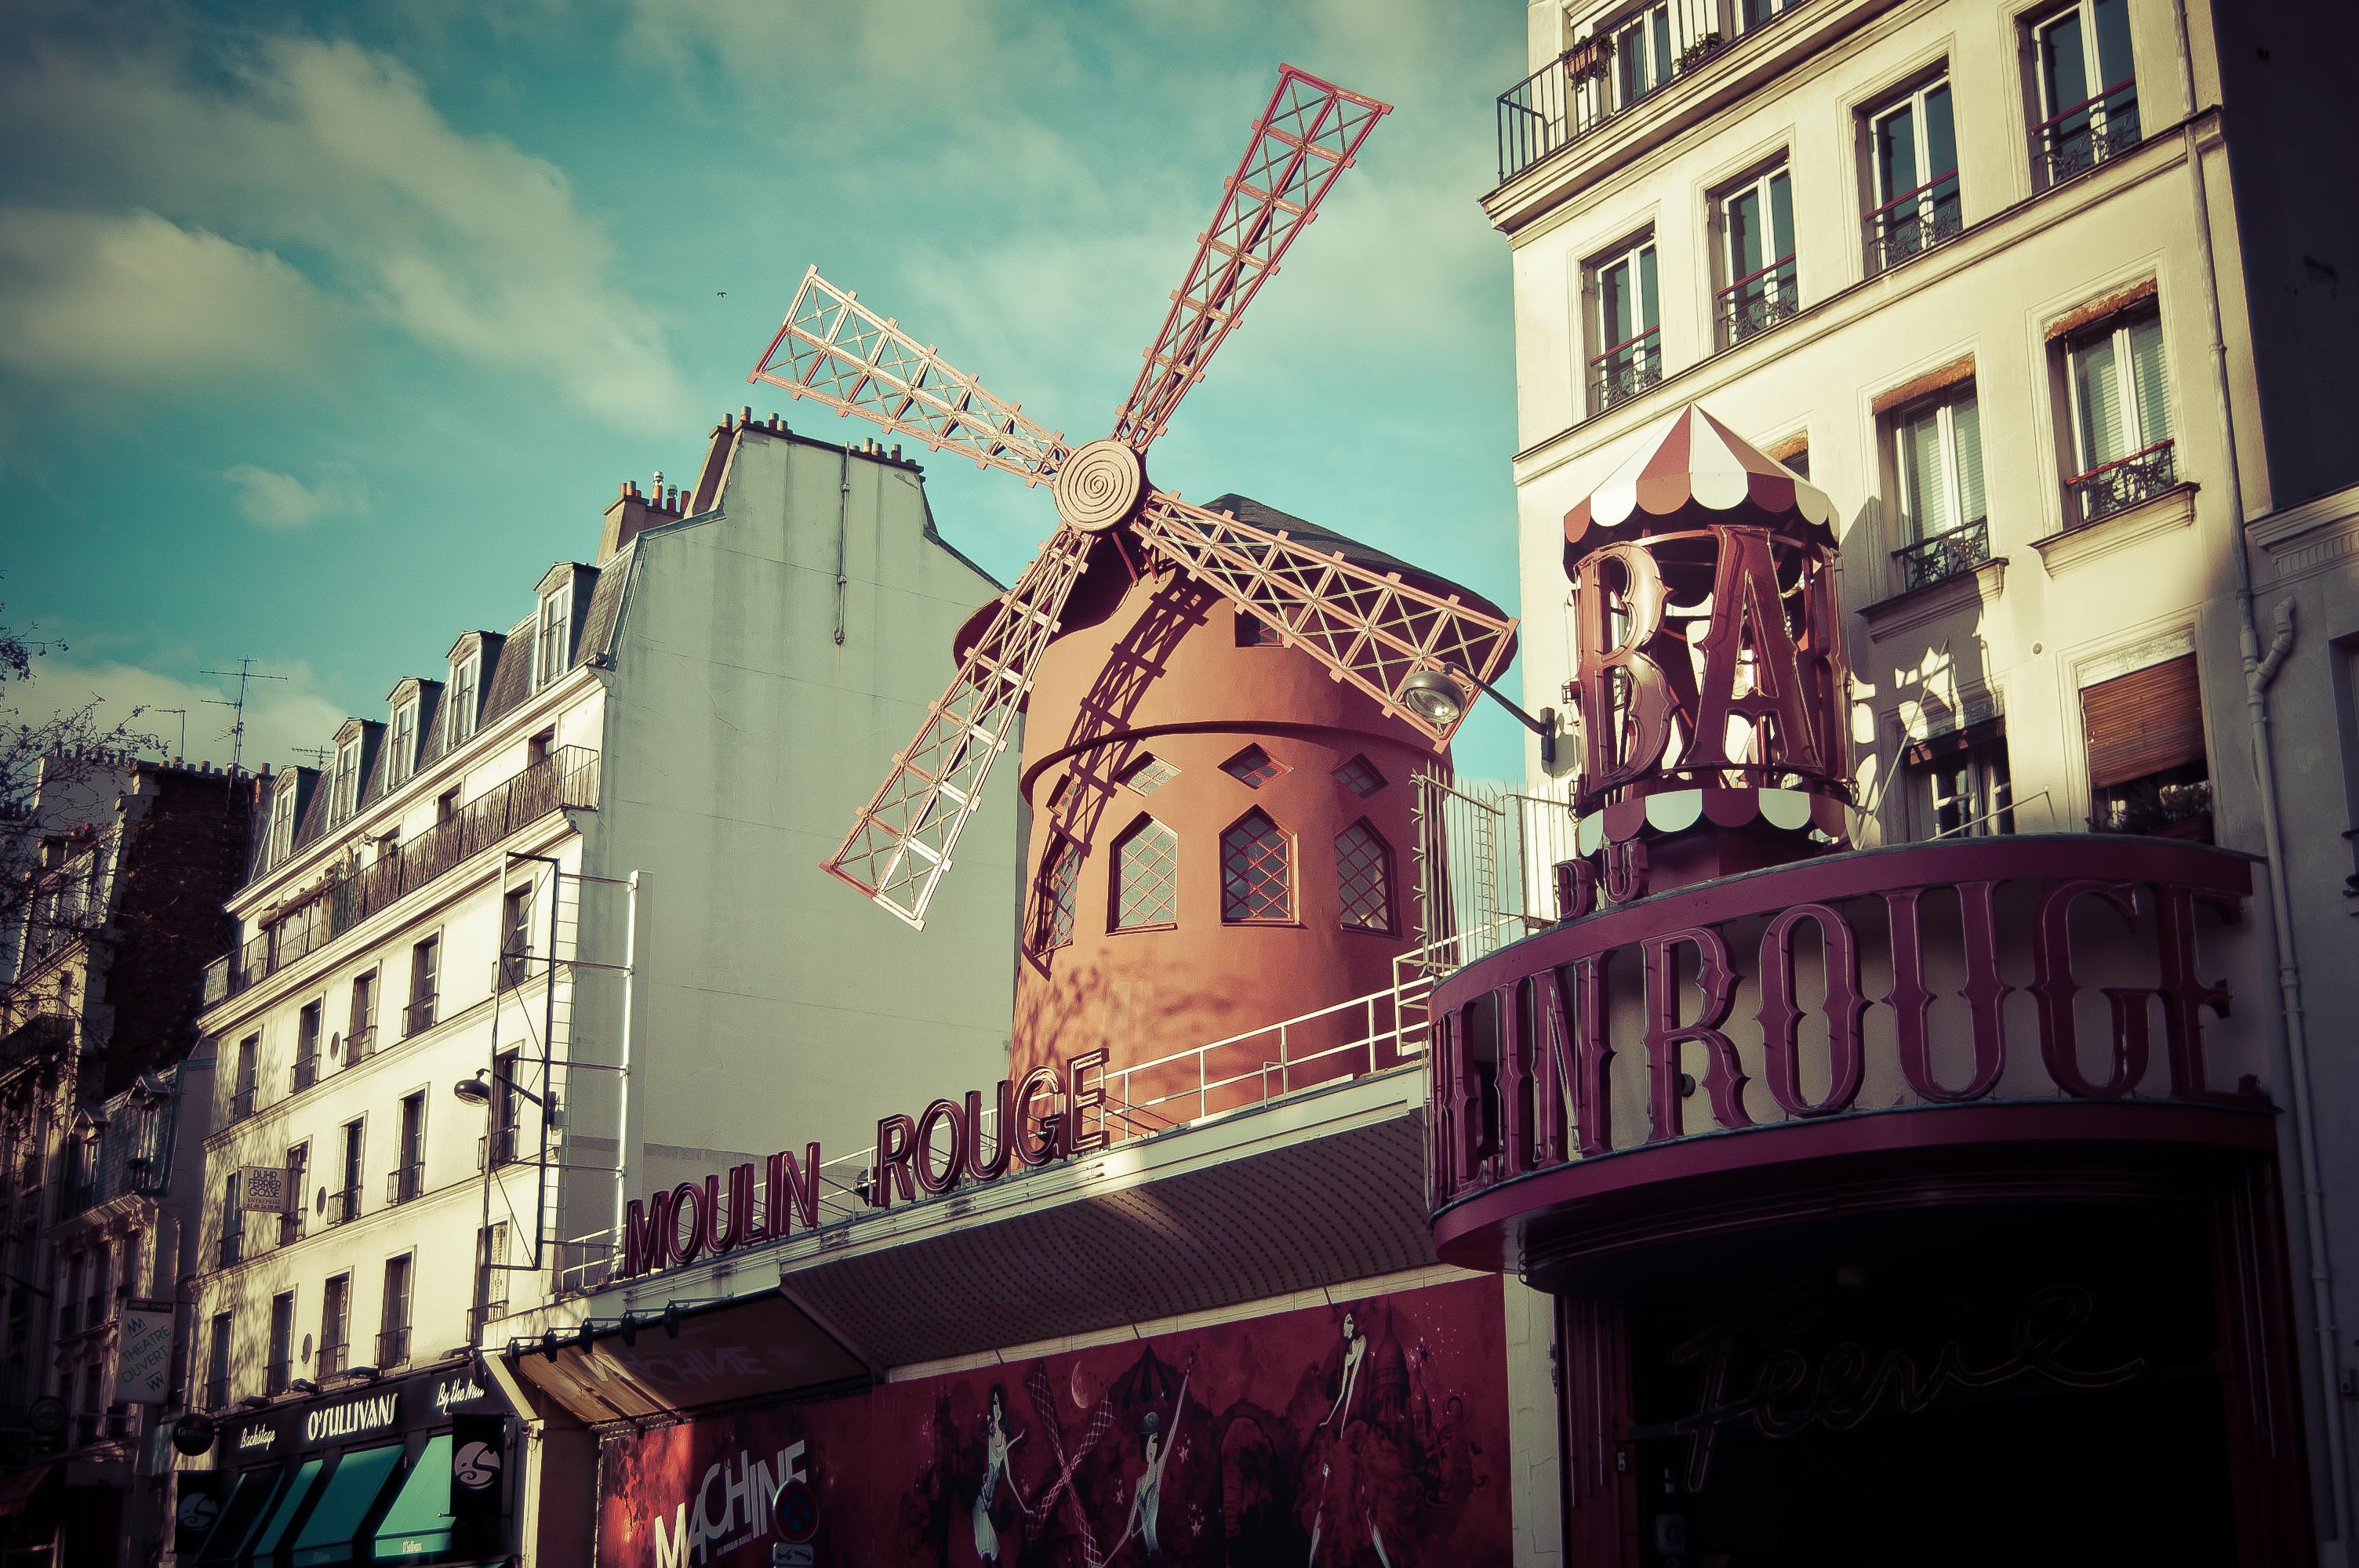 Moulin Rouge David Wickham